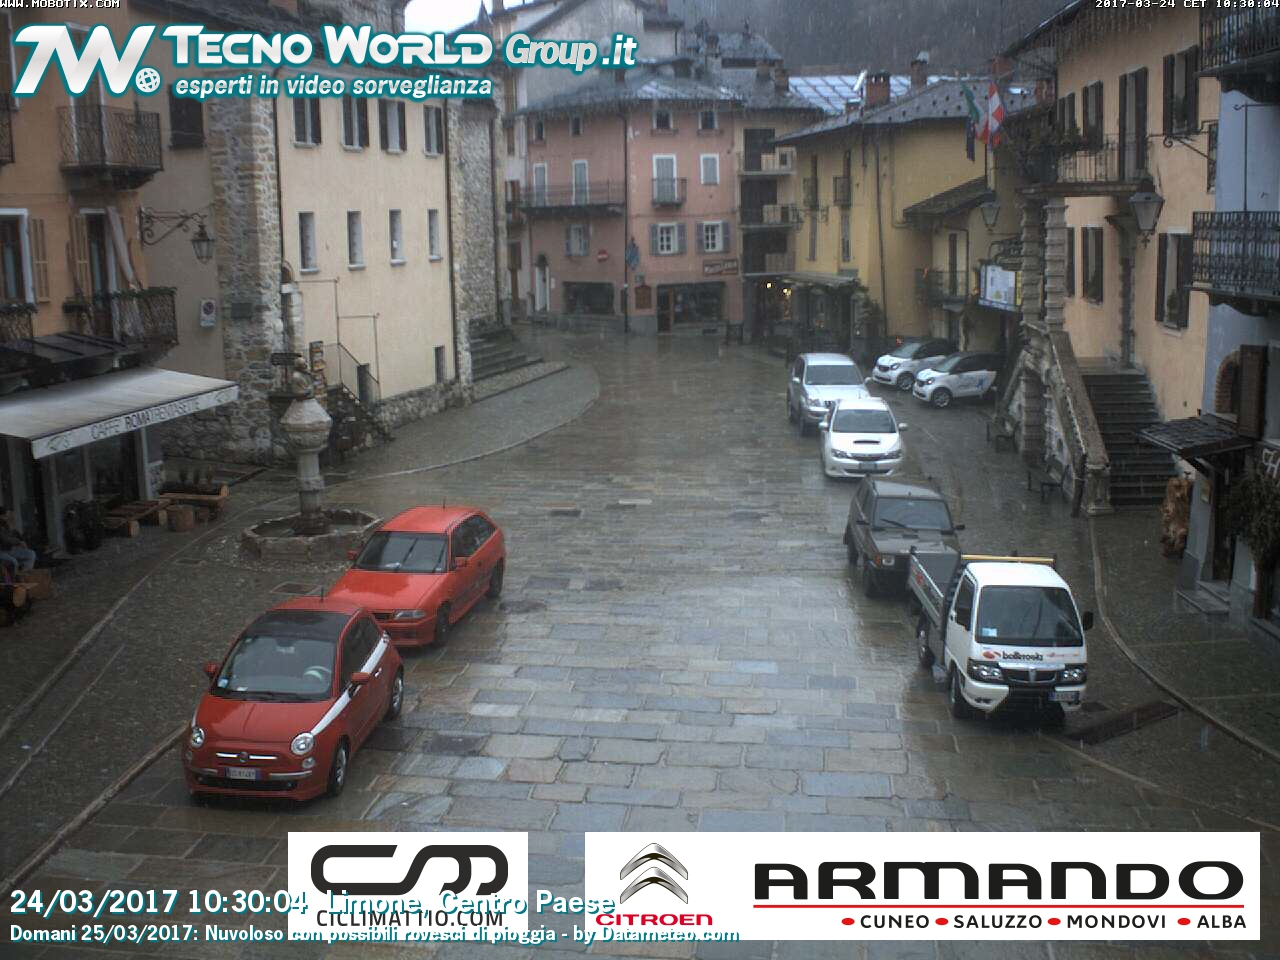 Basso Piemonte 23-31 marzo 2017-lm09-2.jpg